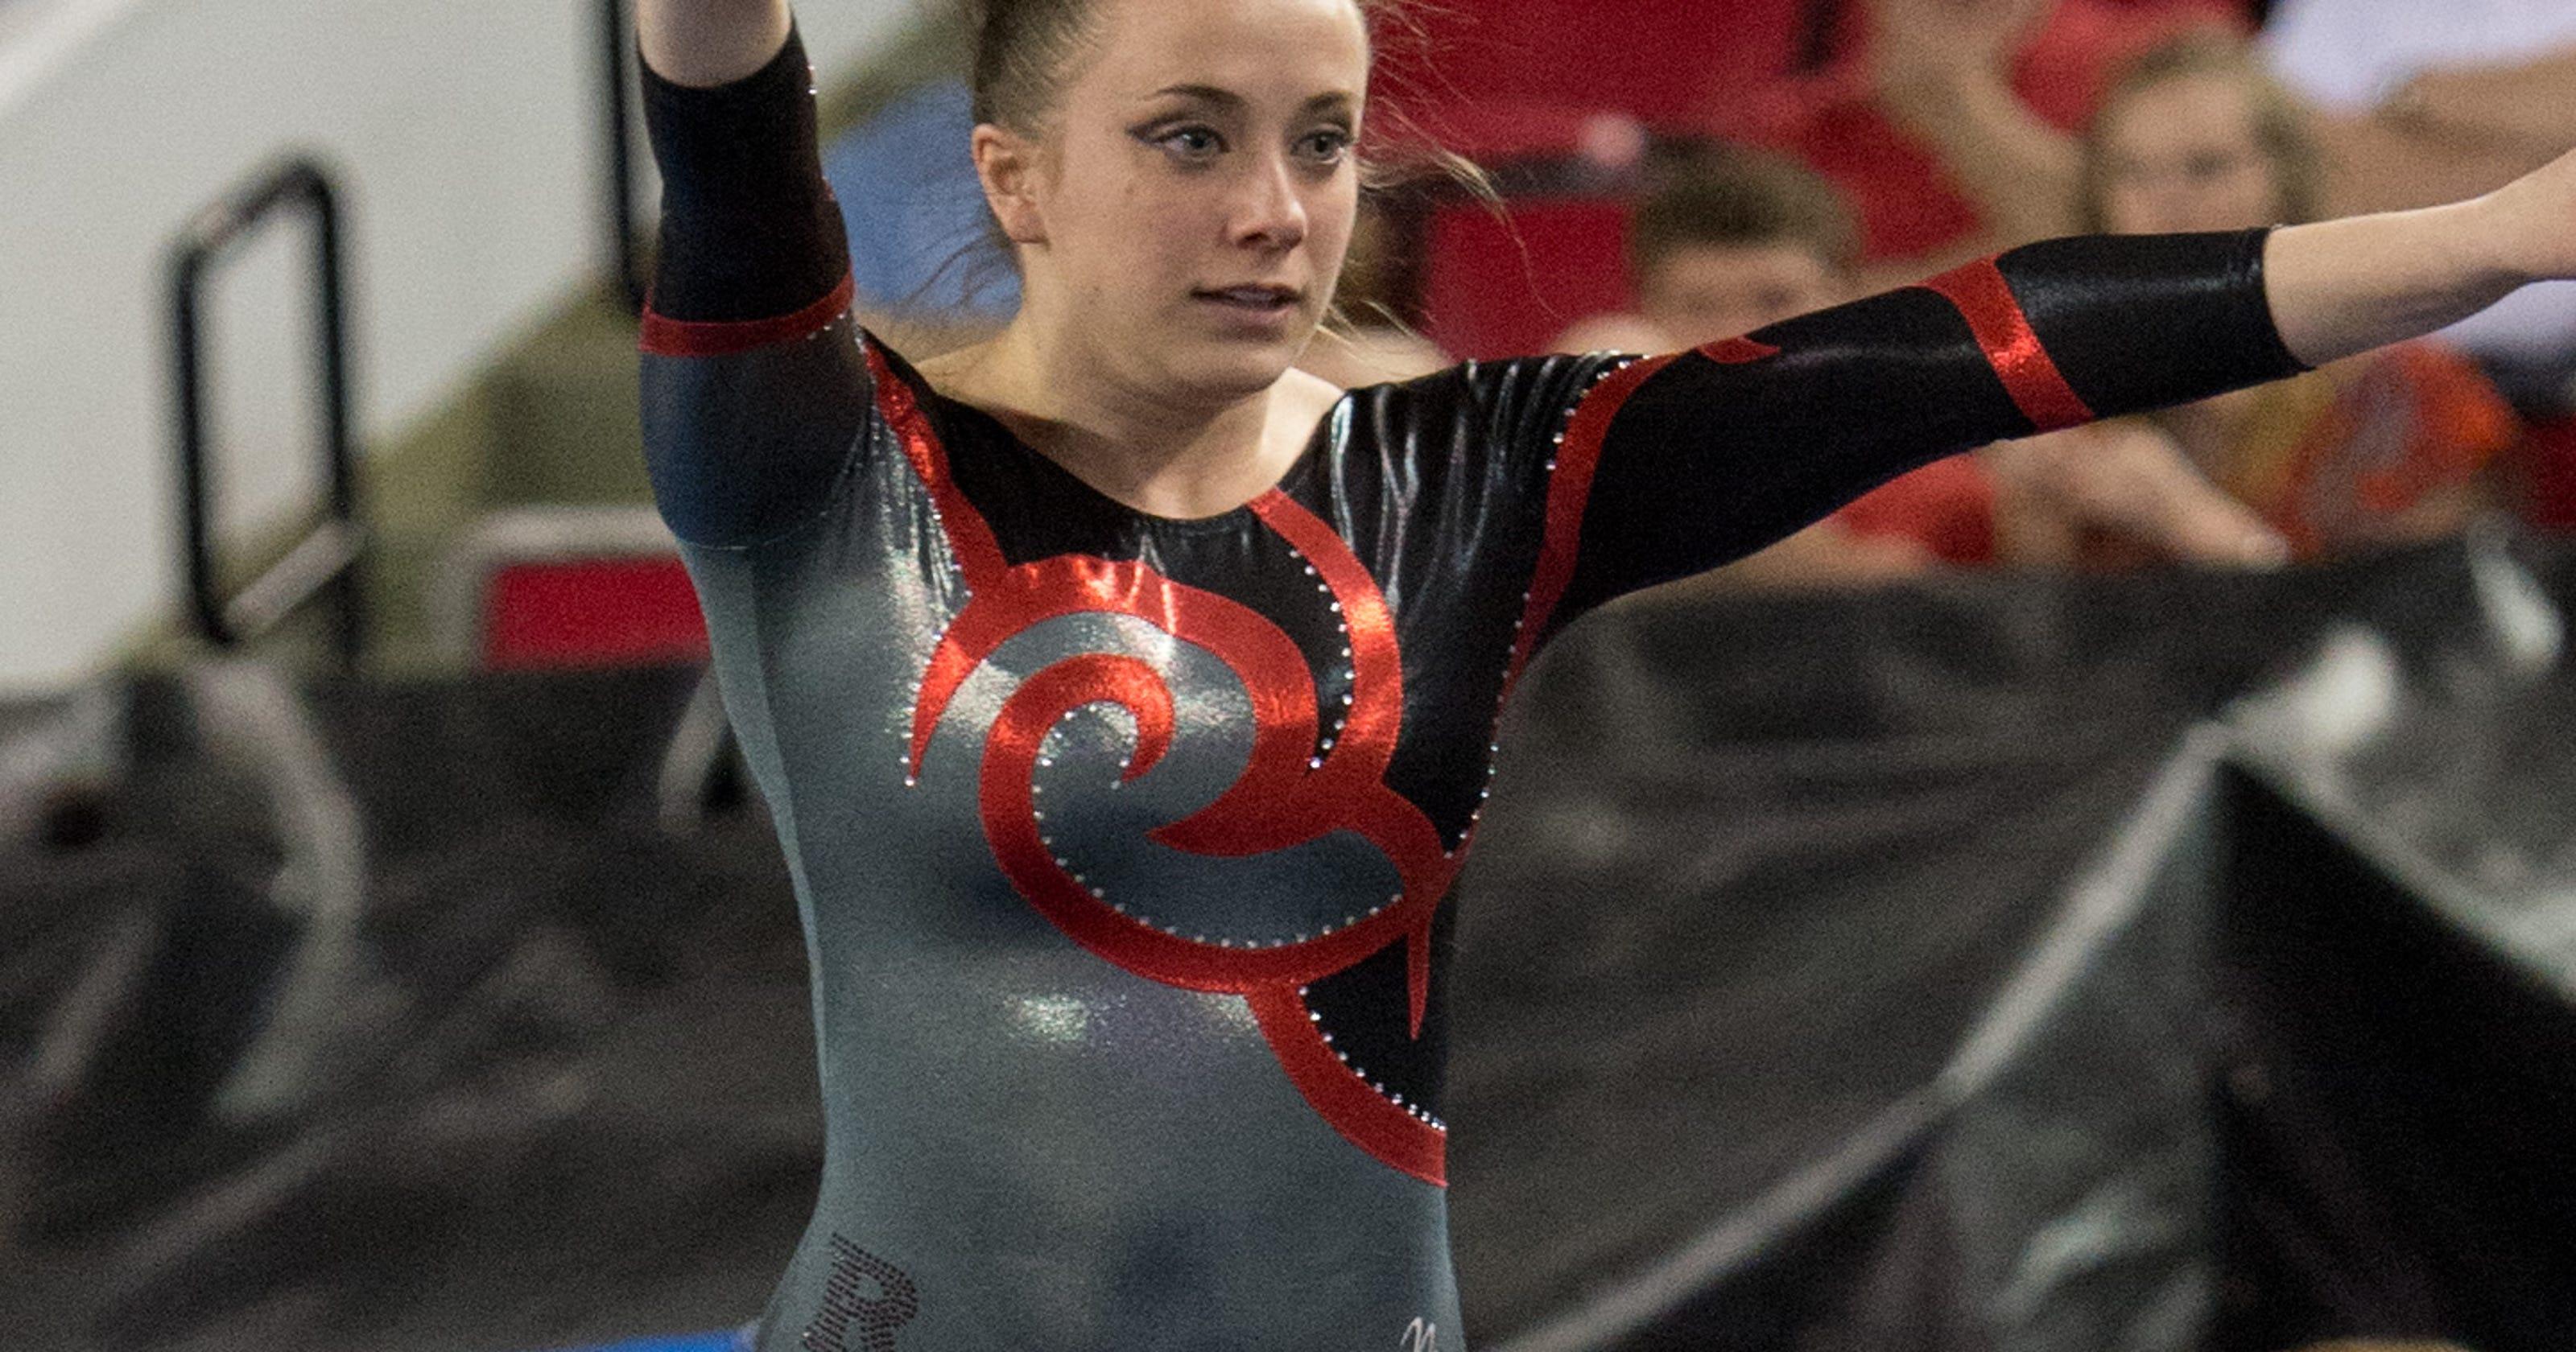 Bouncing back from major injury, LSU gymnast Julianna